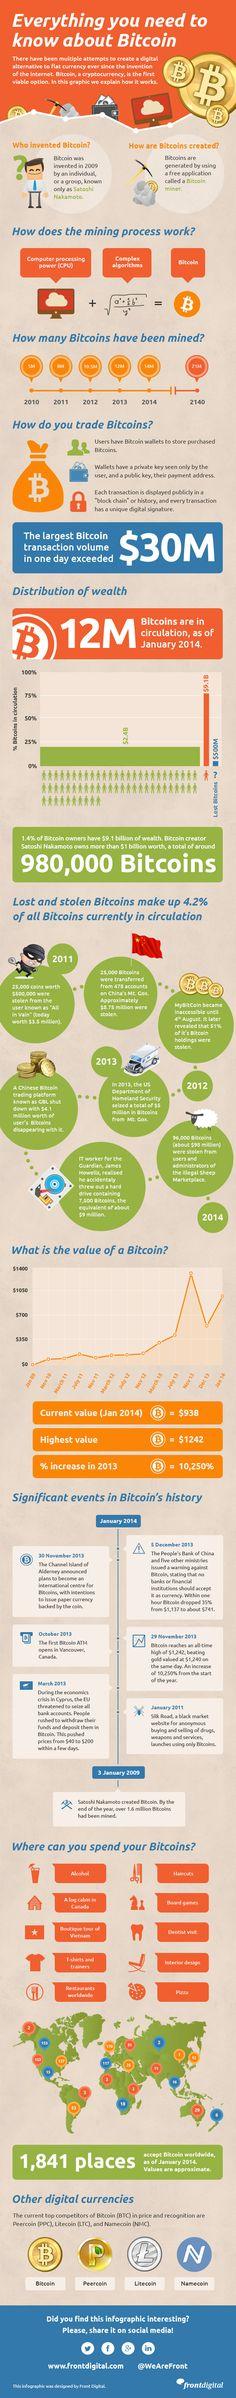 Bitcoin #infographic #internet